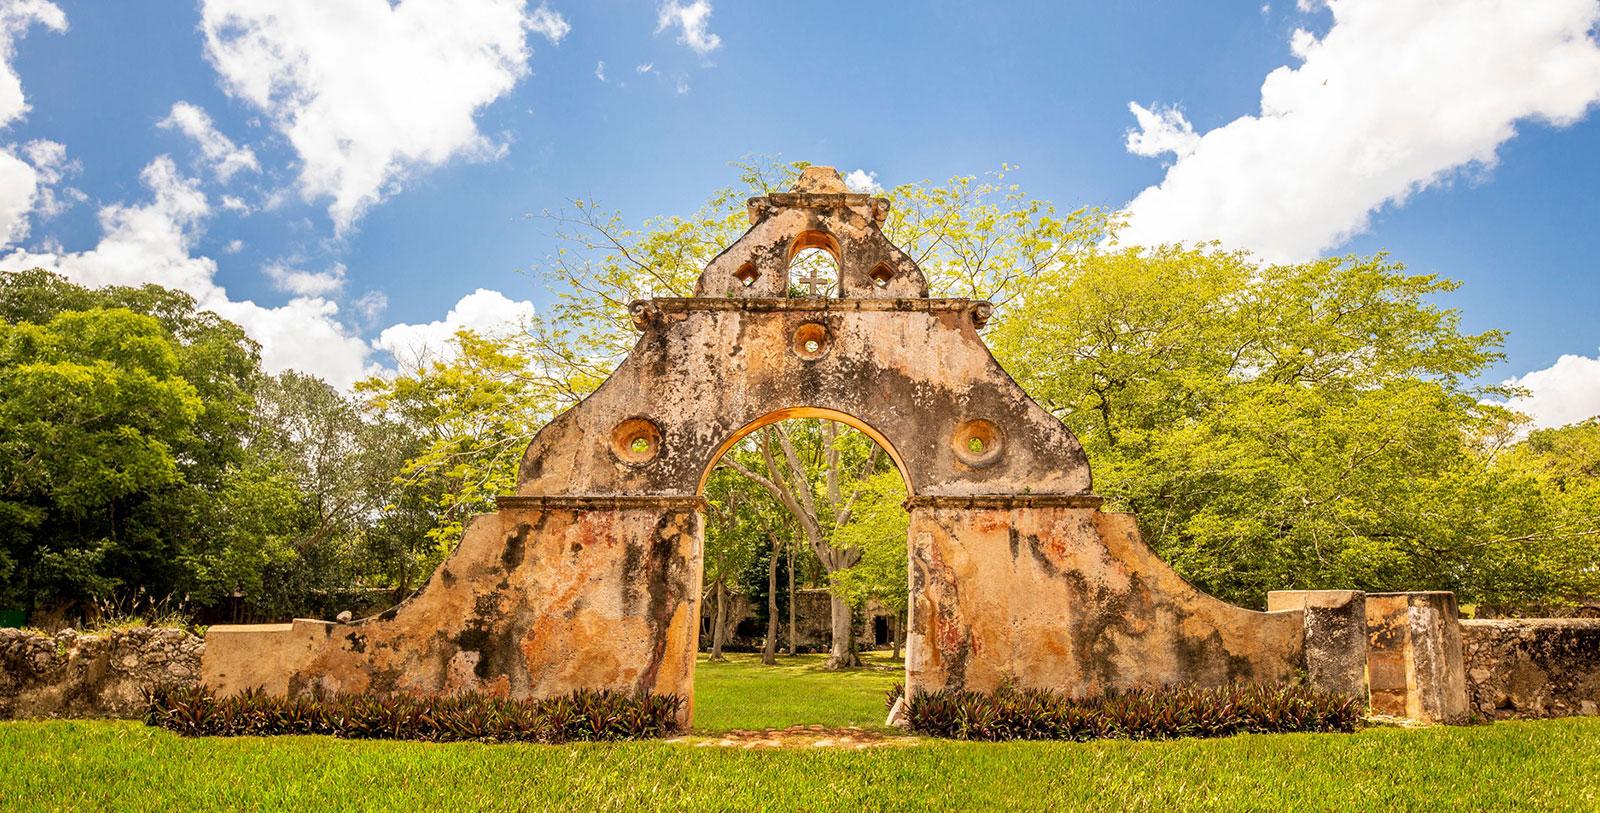 Image of Mayan Ruin near Hotel, Hacienda Uxmal Plantation & Museum, Member of Historic Hotels Worldwide, History